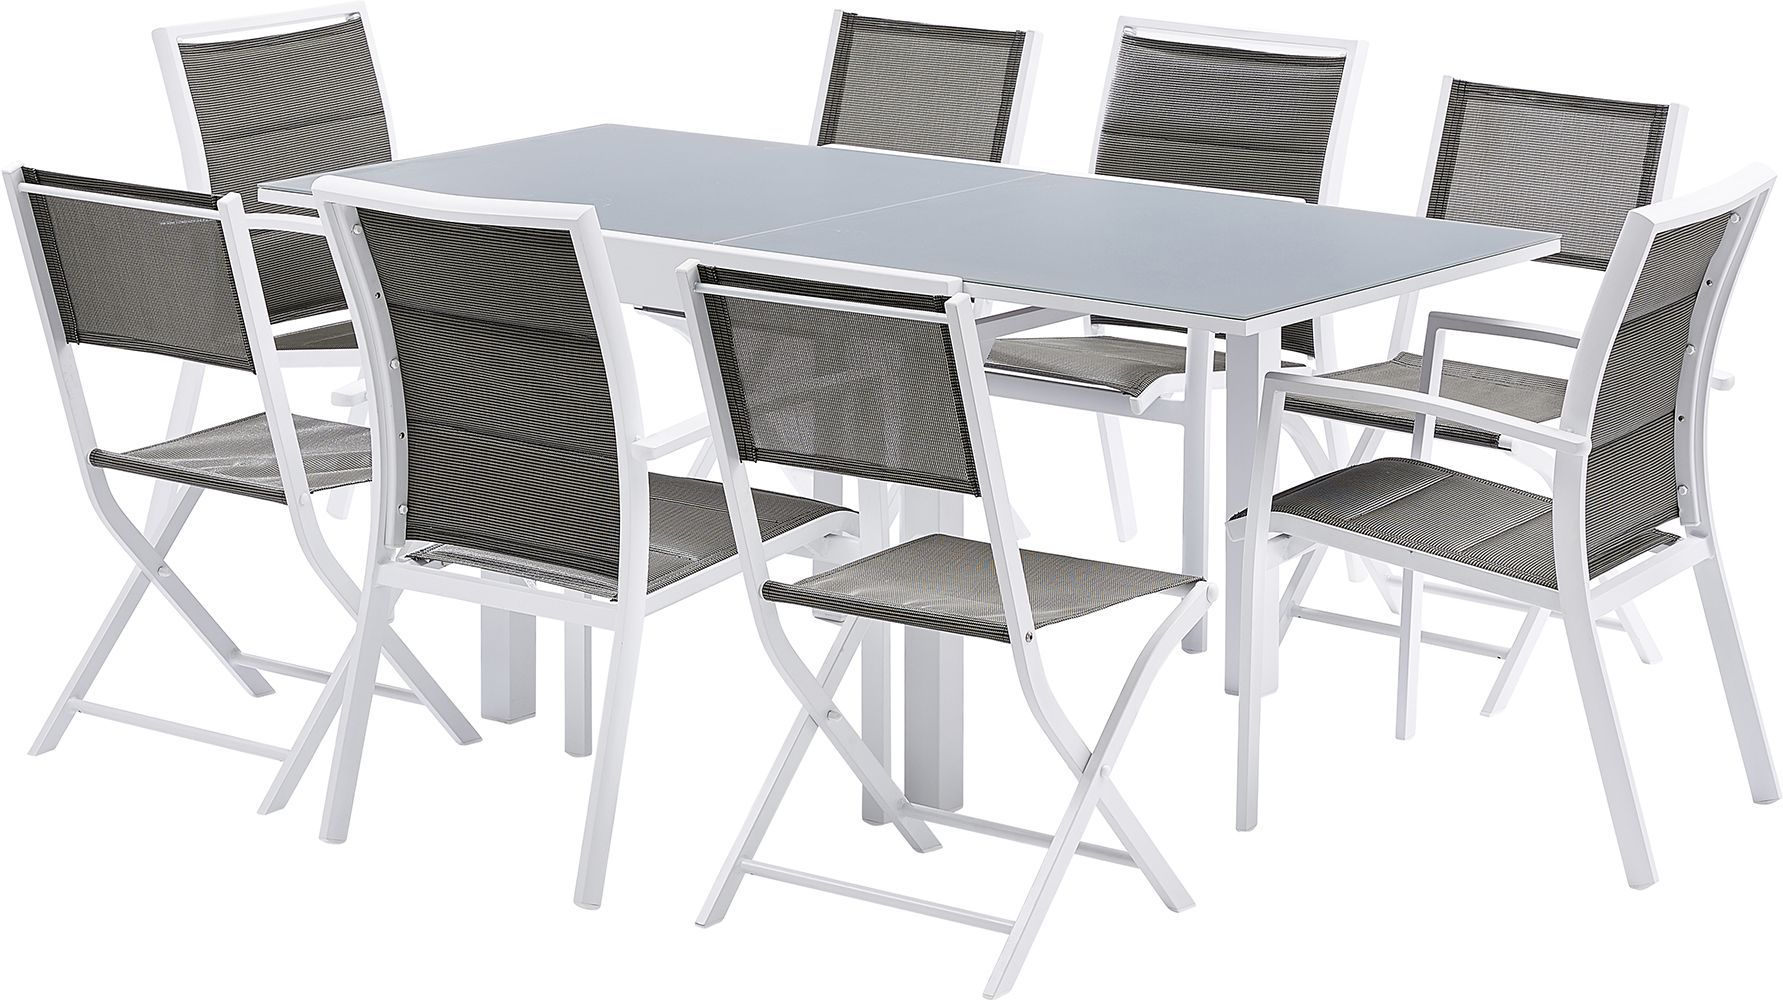 salon de jardin design 8 personnes modulo blanc. Black Bedroom Furniture Sets. Home Design Ideas